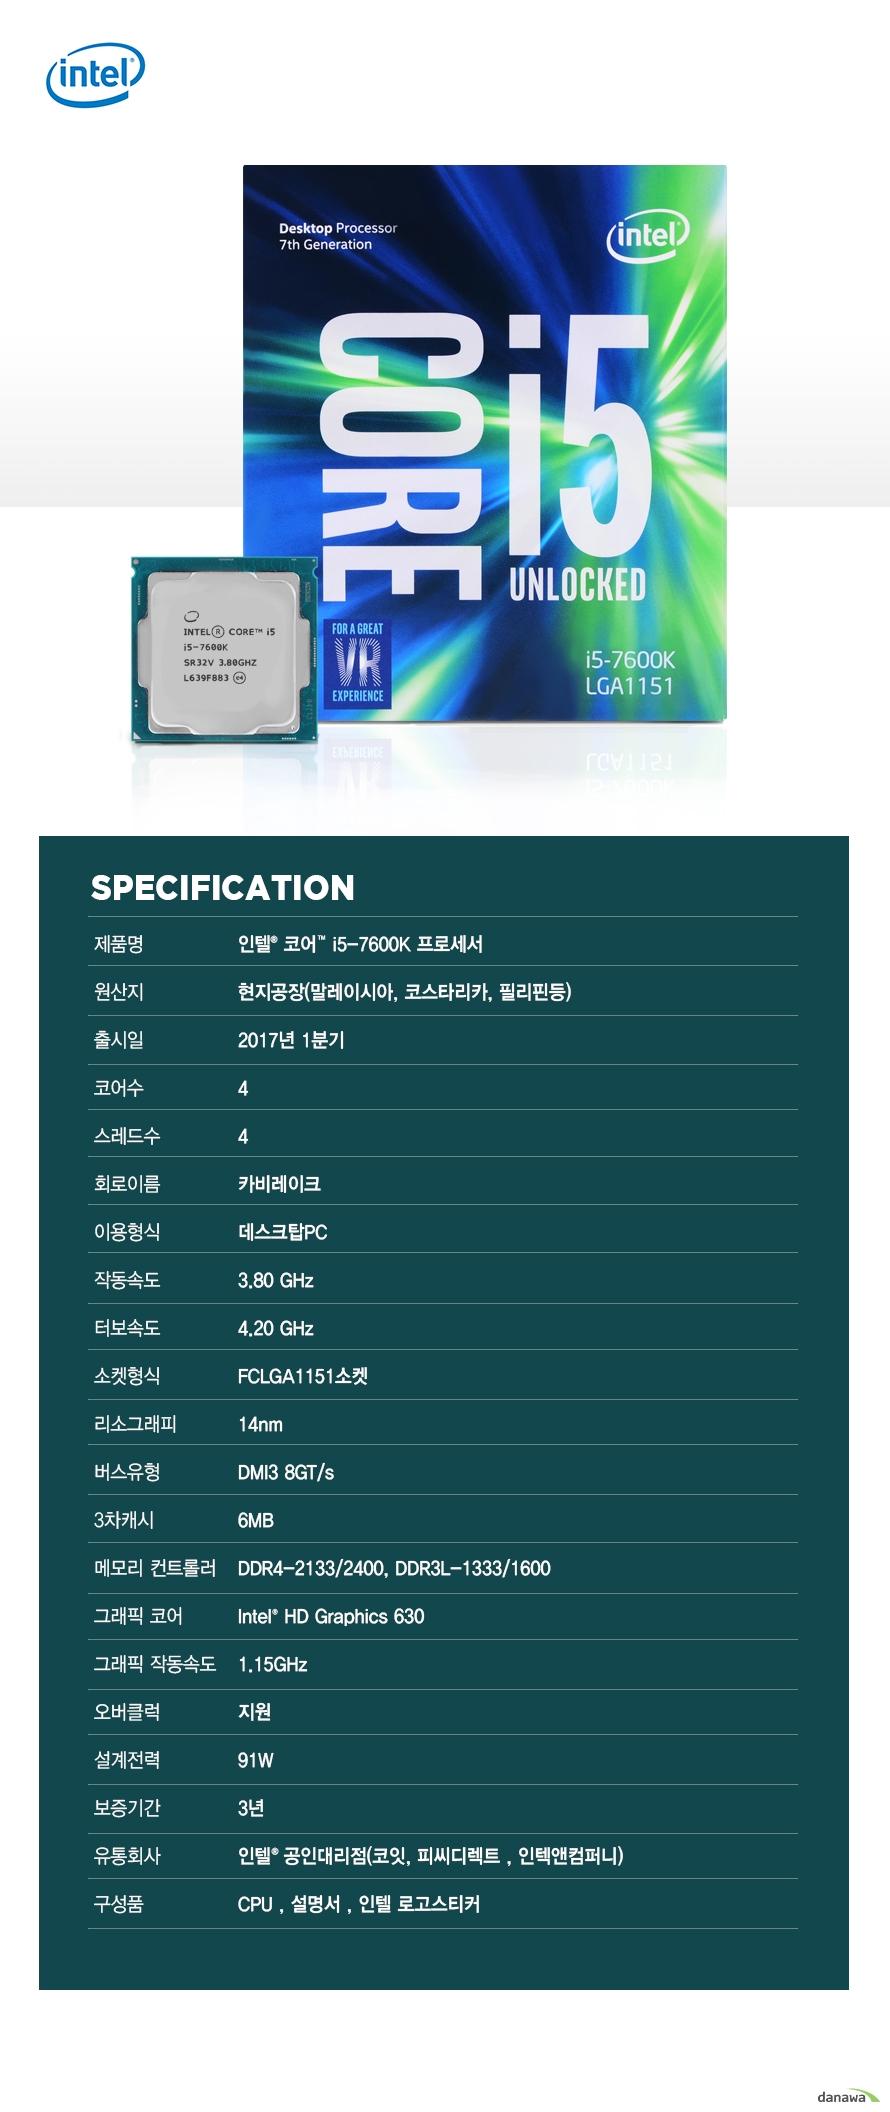 SPECIFICATION                제품명 인텔 코어 i5 - 7600K 프로세서                        원산지 현지공장 말레이시아 코스타리카 필리핀등                출시일 2017년 1분기                코어수 4                스레드수 4                회로이름 카비레이크                이용형식 데스크탑PC                작동속도 3.80GHZ                터보속도 4.20GHZ                소켓형식 FCLGA1151소켓                리소그래피 14NM                버스유형 DMI3 8GT/S                3차캐시 6MB                메모리 컨트롤러 DDR4-2133/2400 DDR3L-1333/1600                그래픽 코어 INTEL HD GRAPHICS 630                그래픽 작동속도 1.15GHZ                오버클럭 지원                설계전력 91W                보증기간 3년                유통회사 인텔 공인대리점 코잇 피씨디렉트 인텍엔 컴퍼니                구성품 CPU 설명서 인텔 로고스티커